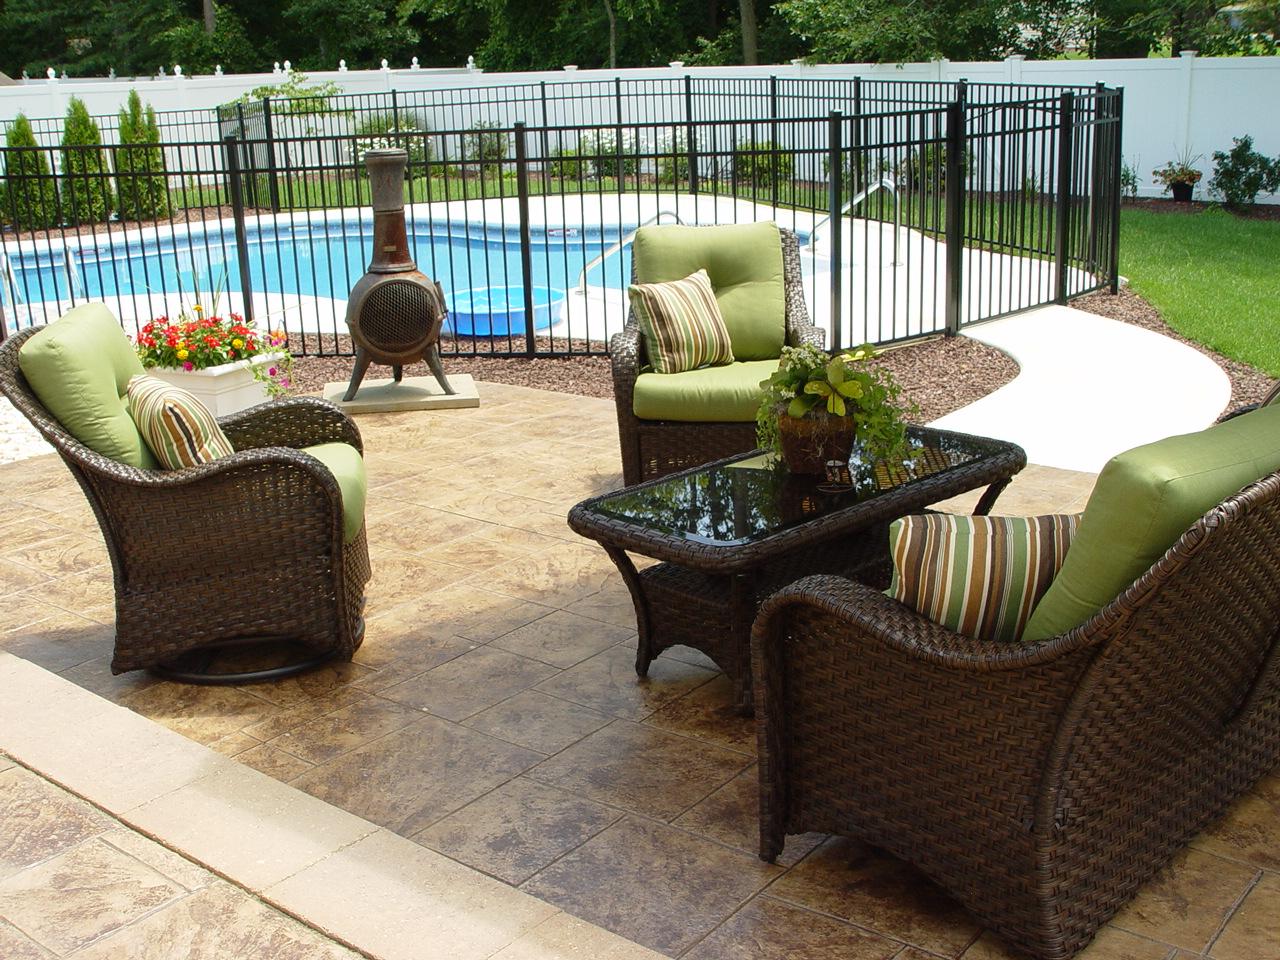 concrete patio morganville nj 07751 patio driveways stamped concrete - Concrete Patio Designs Layouts